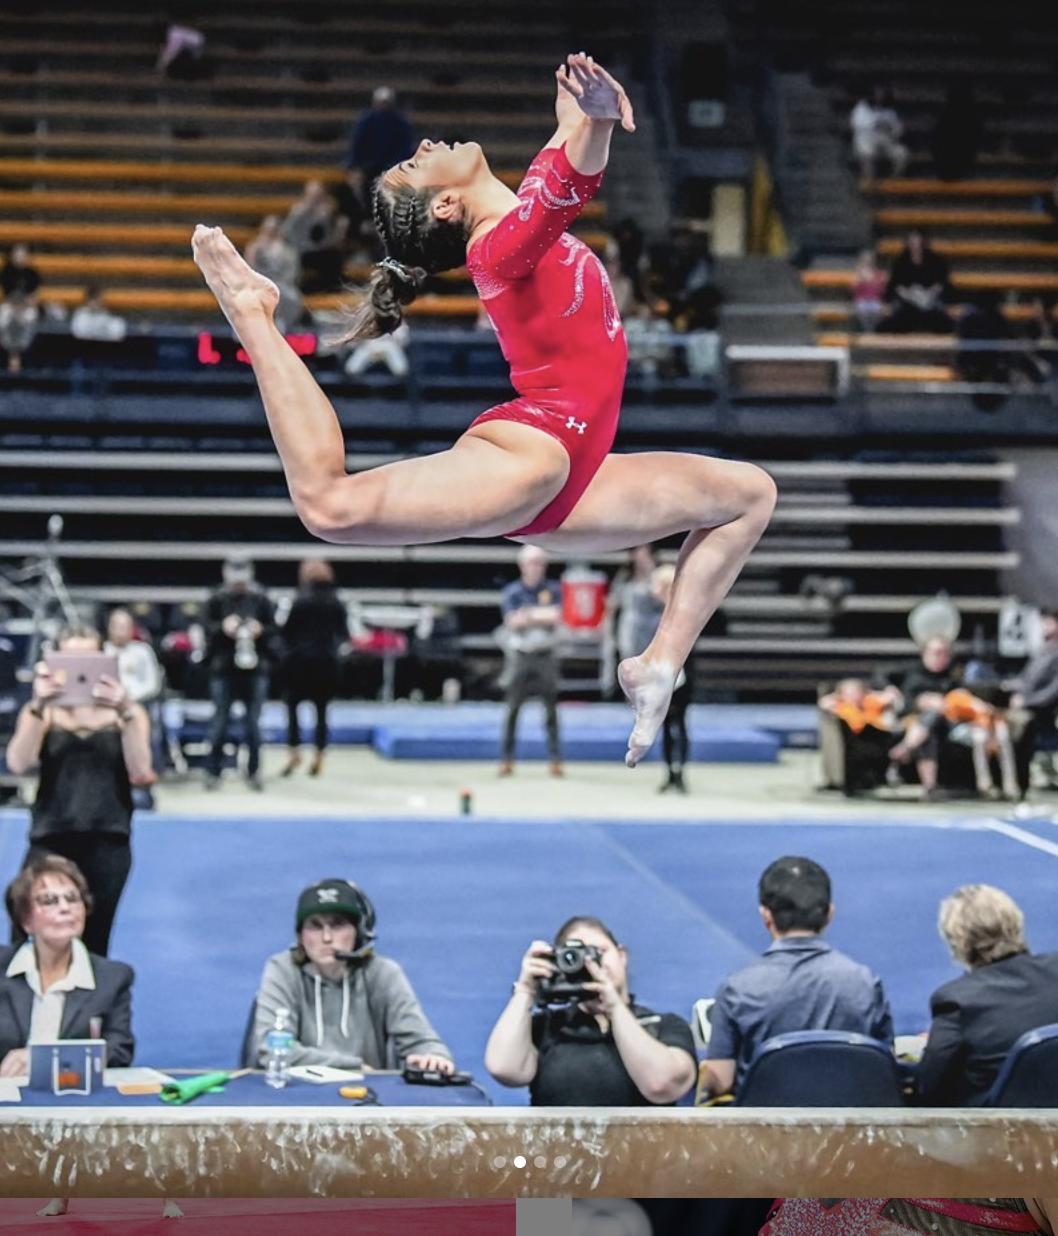 a gymnast jumping on the balance beam